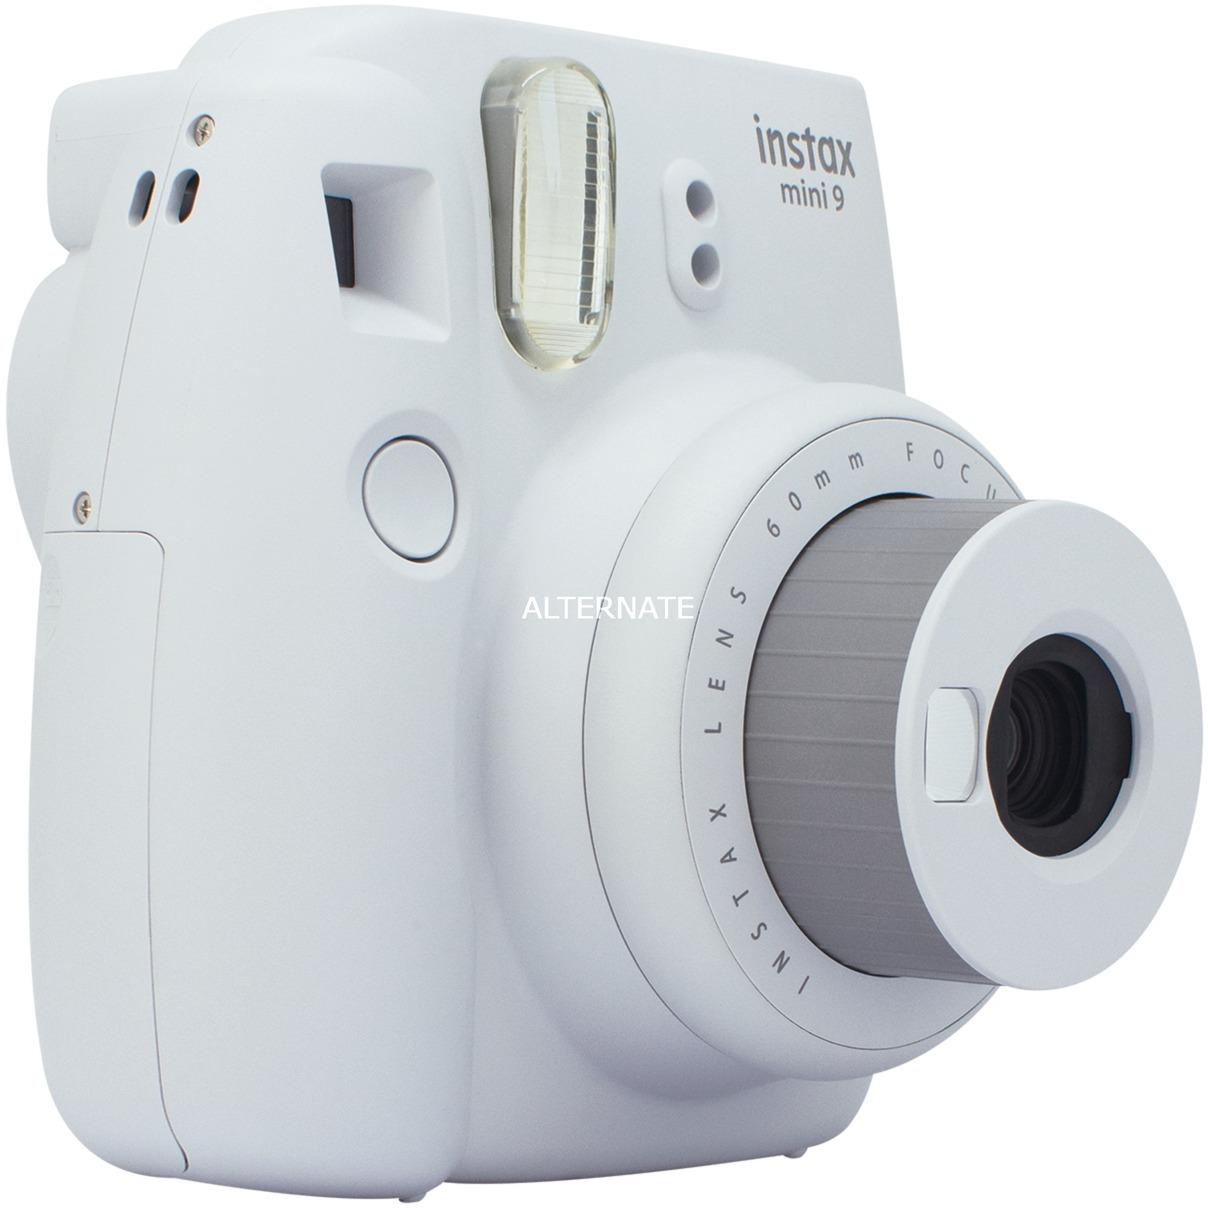 Instax Mini 9 62 x 46 mm Blanco, Cámara instantánea